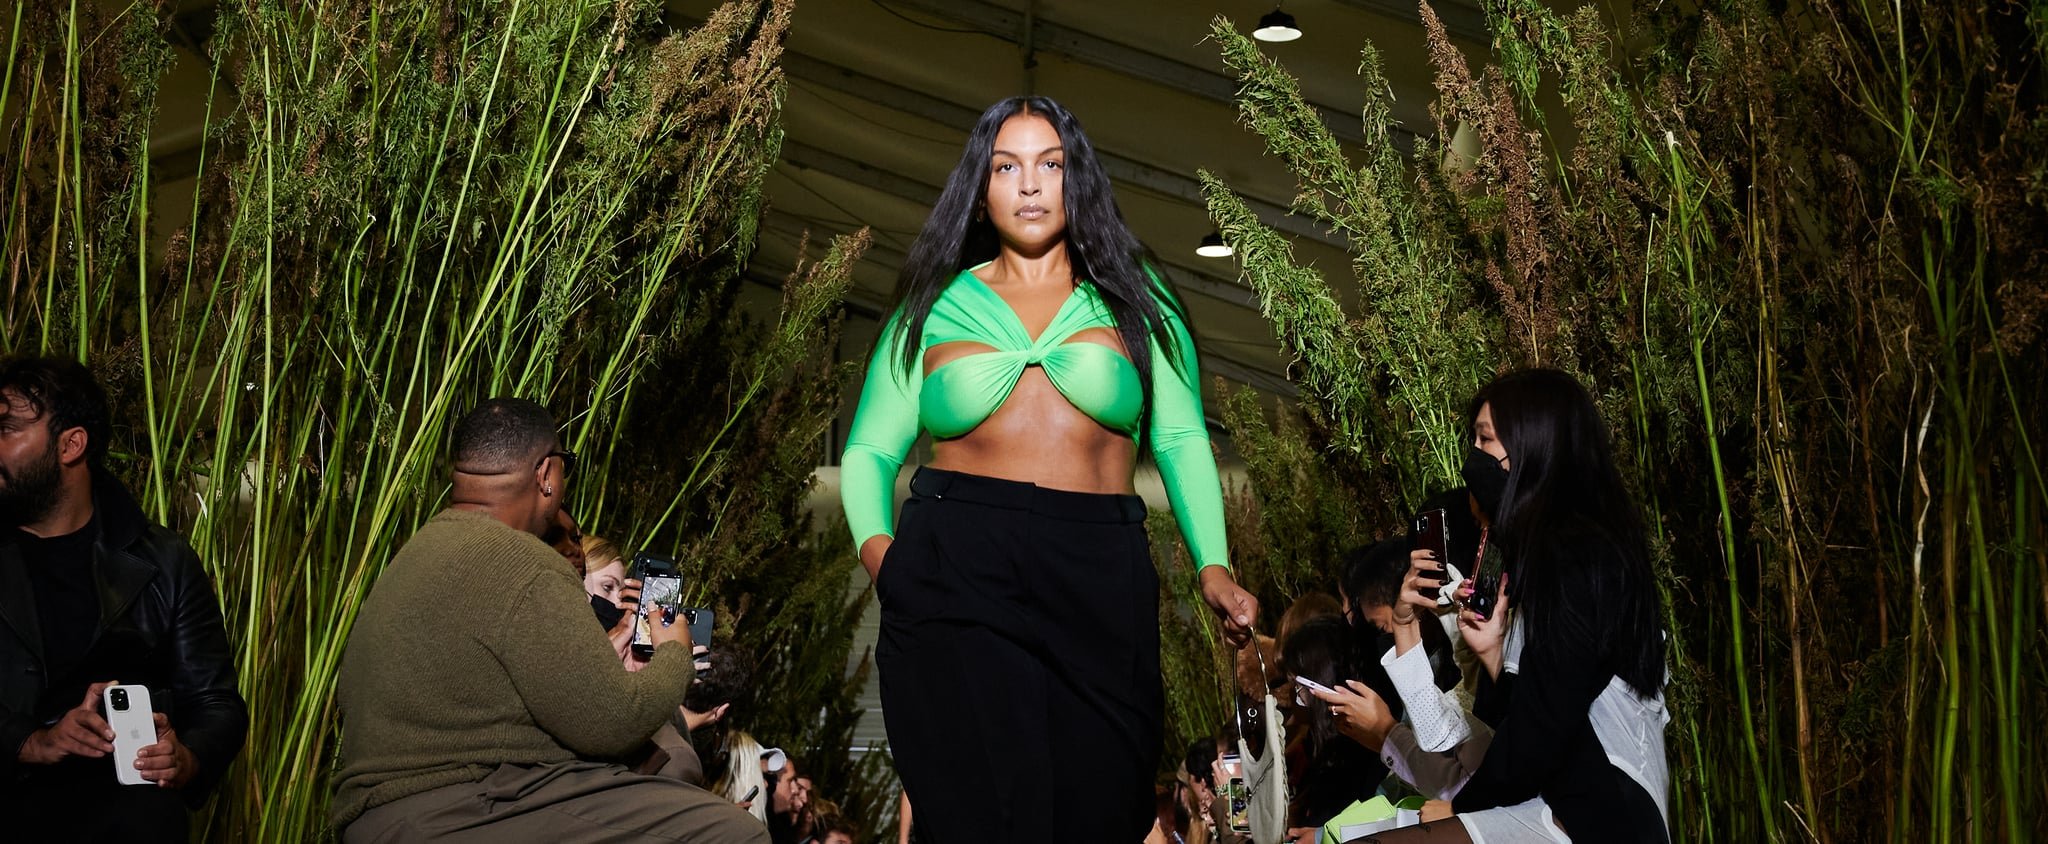 Size Inclusivity at Fashion Week